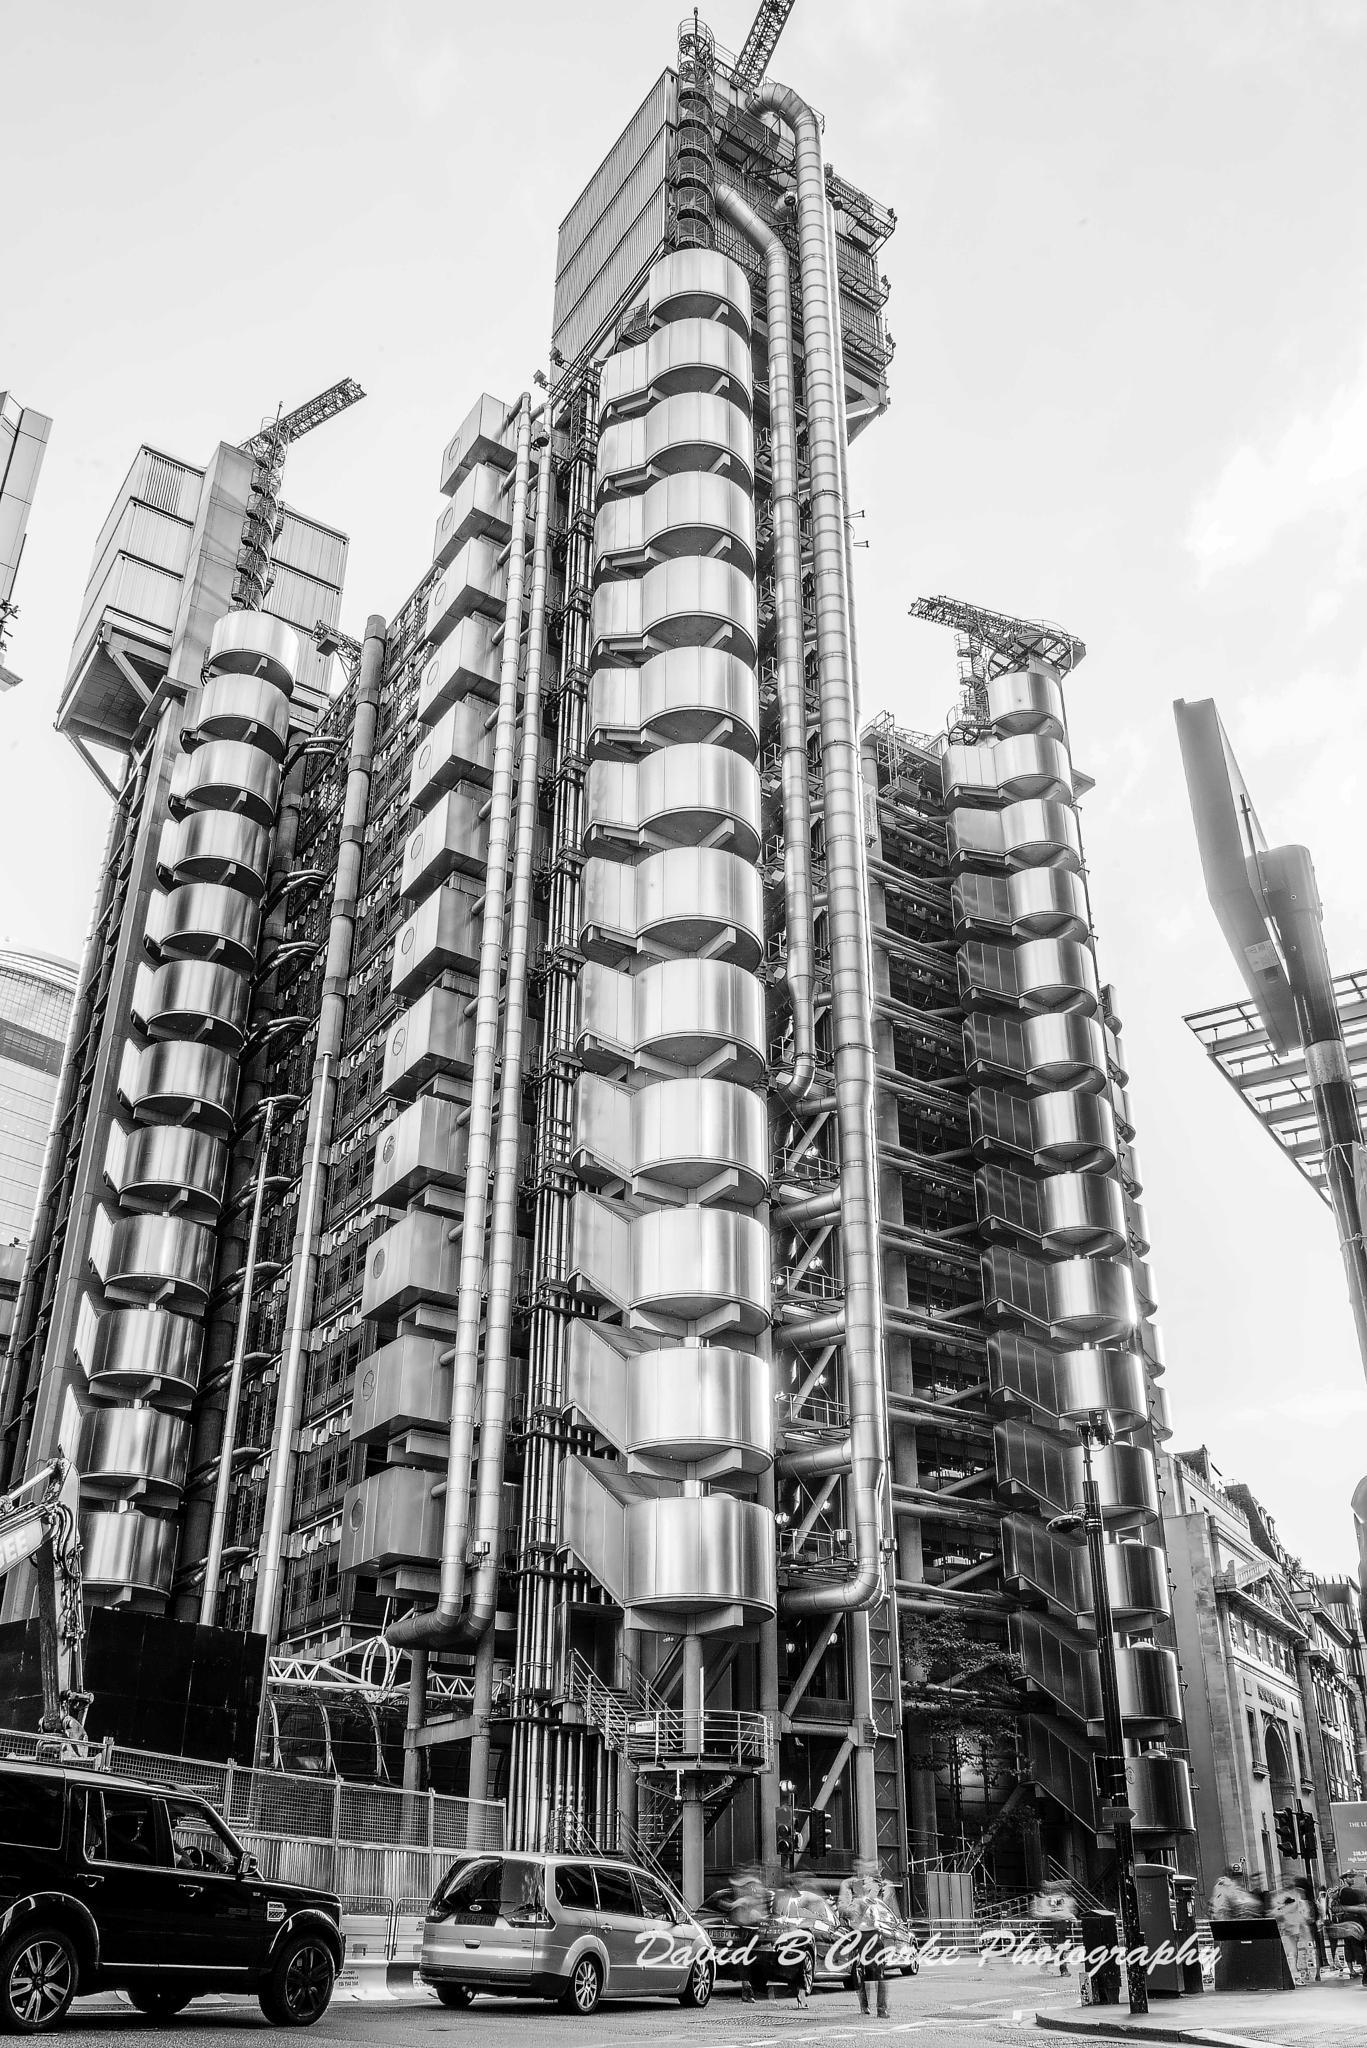 lloyds building by dc_dundalk